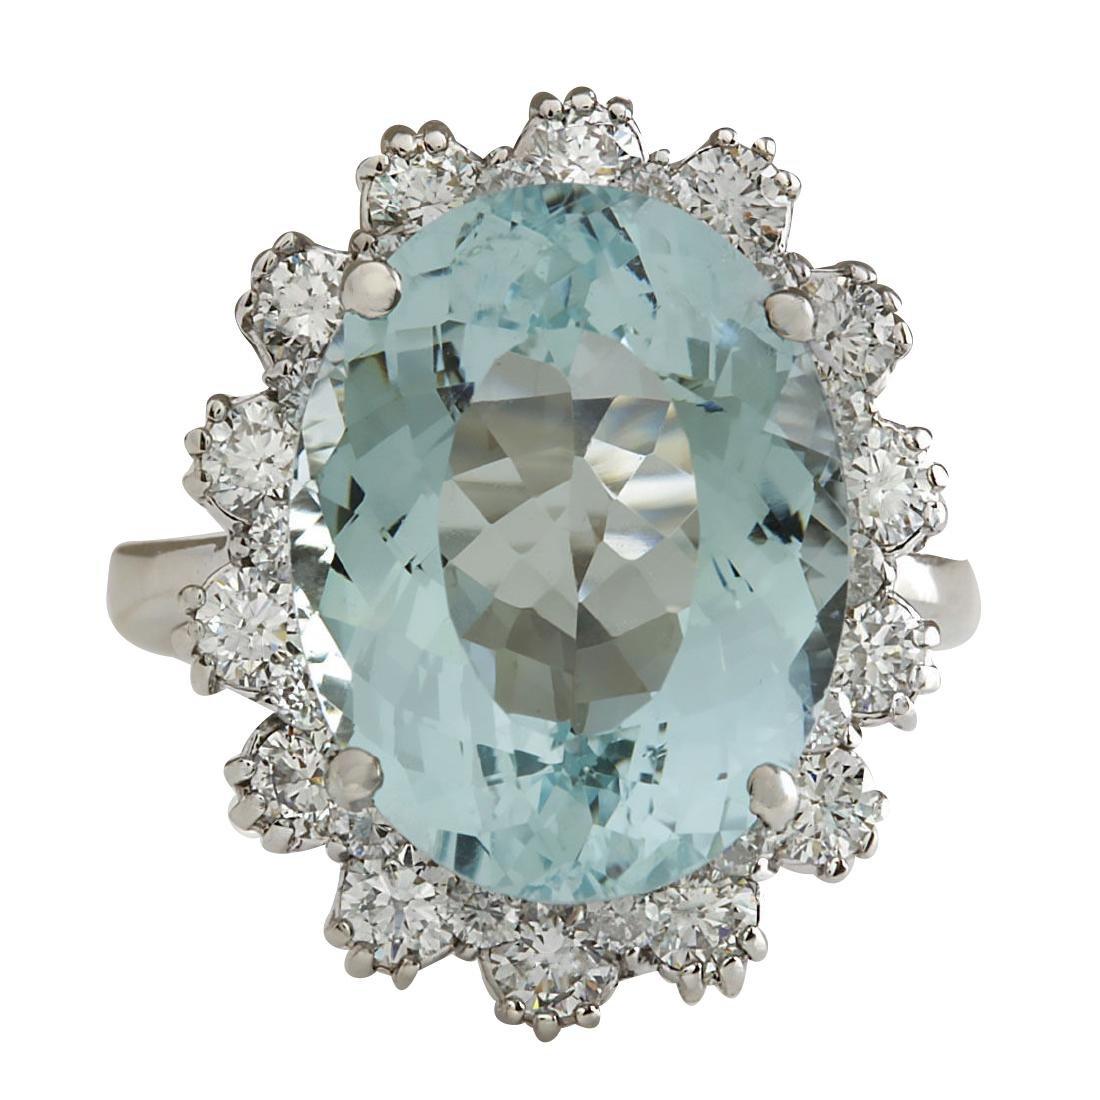 10.25CTW Natural Aquamarine And Diamond Ring In 18K